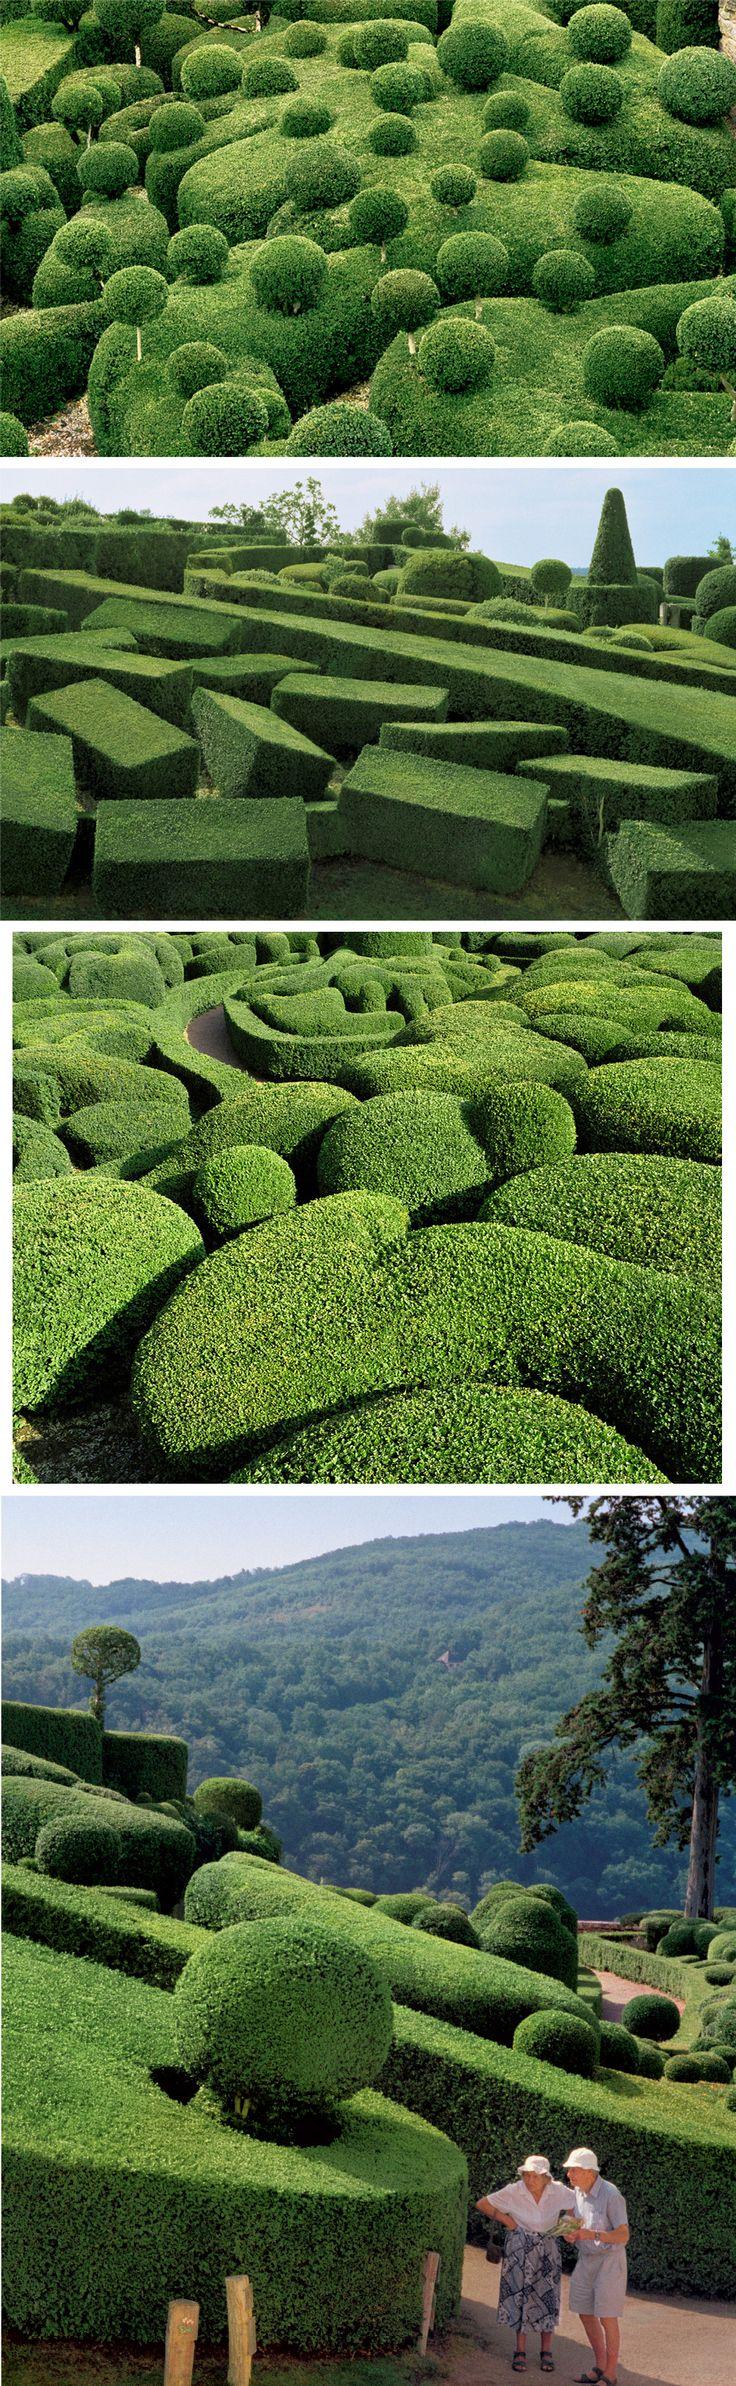 best gardening images on pinterest landscaping garden deco